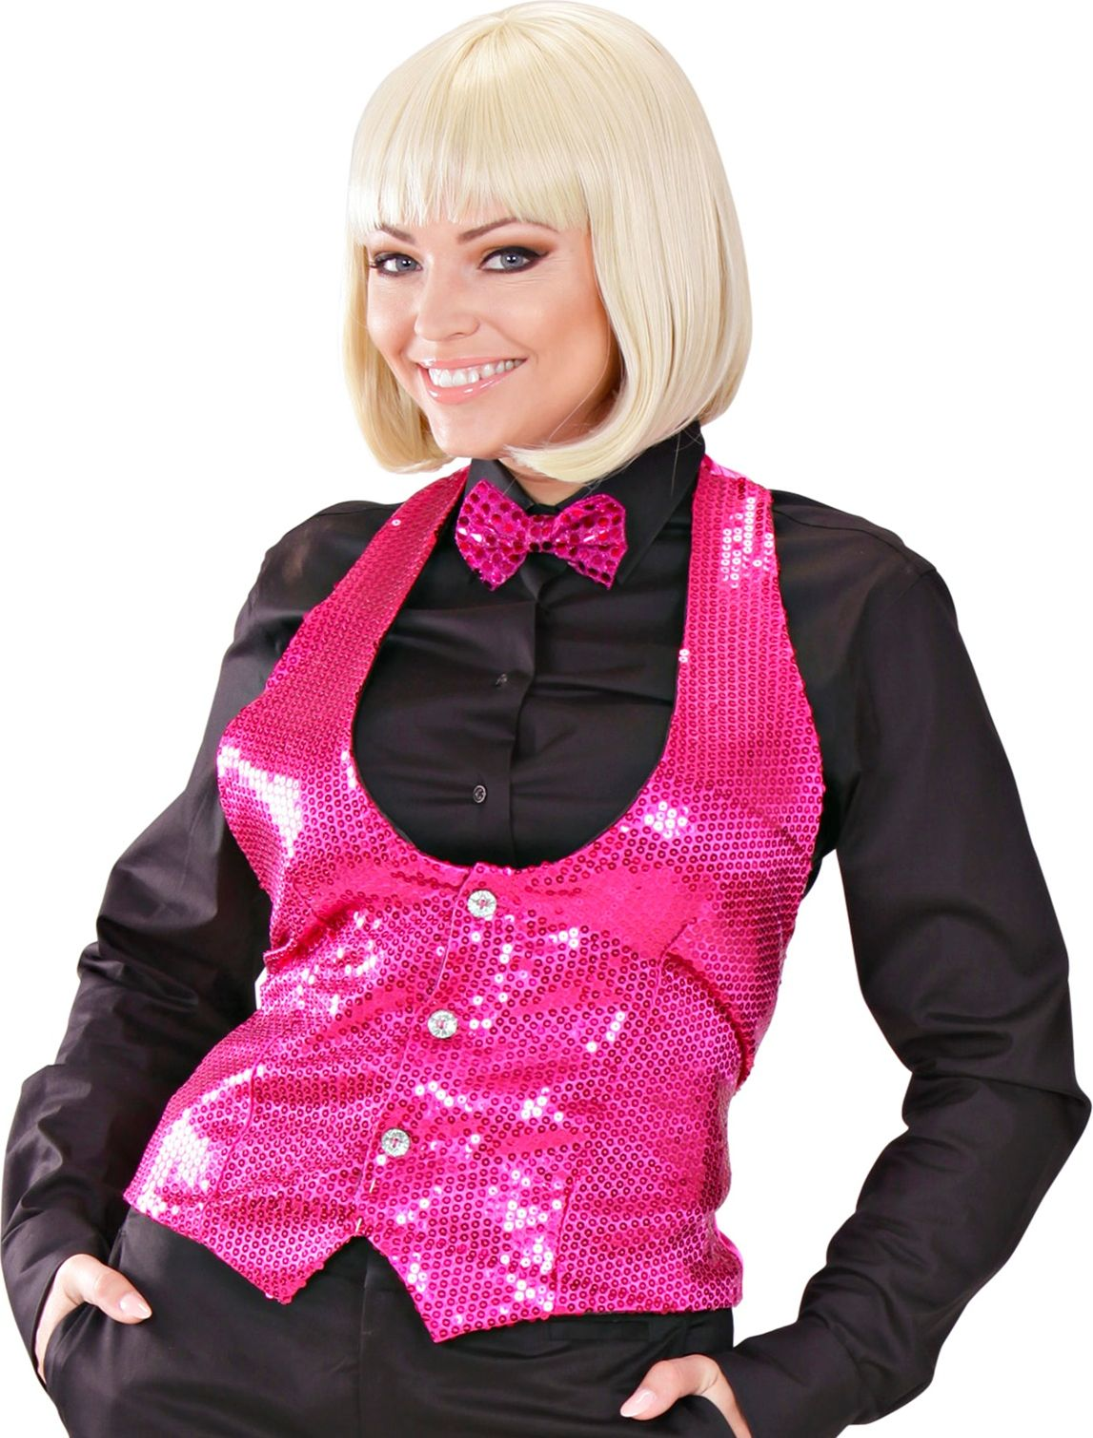 Roze dames vest met pailletten